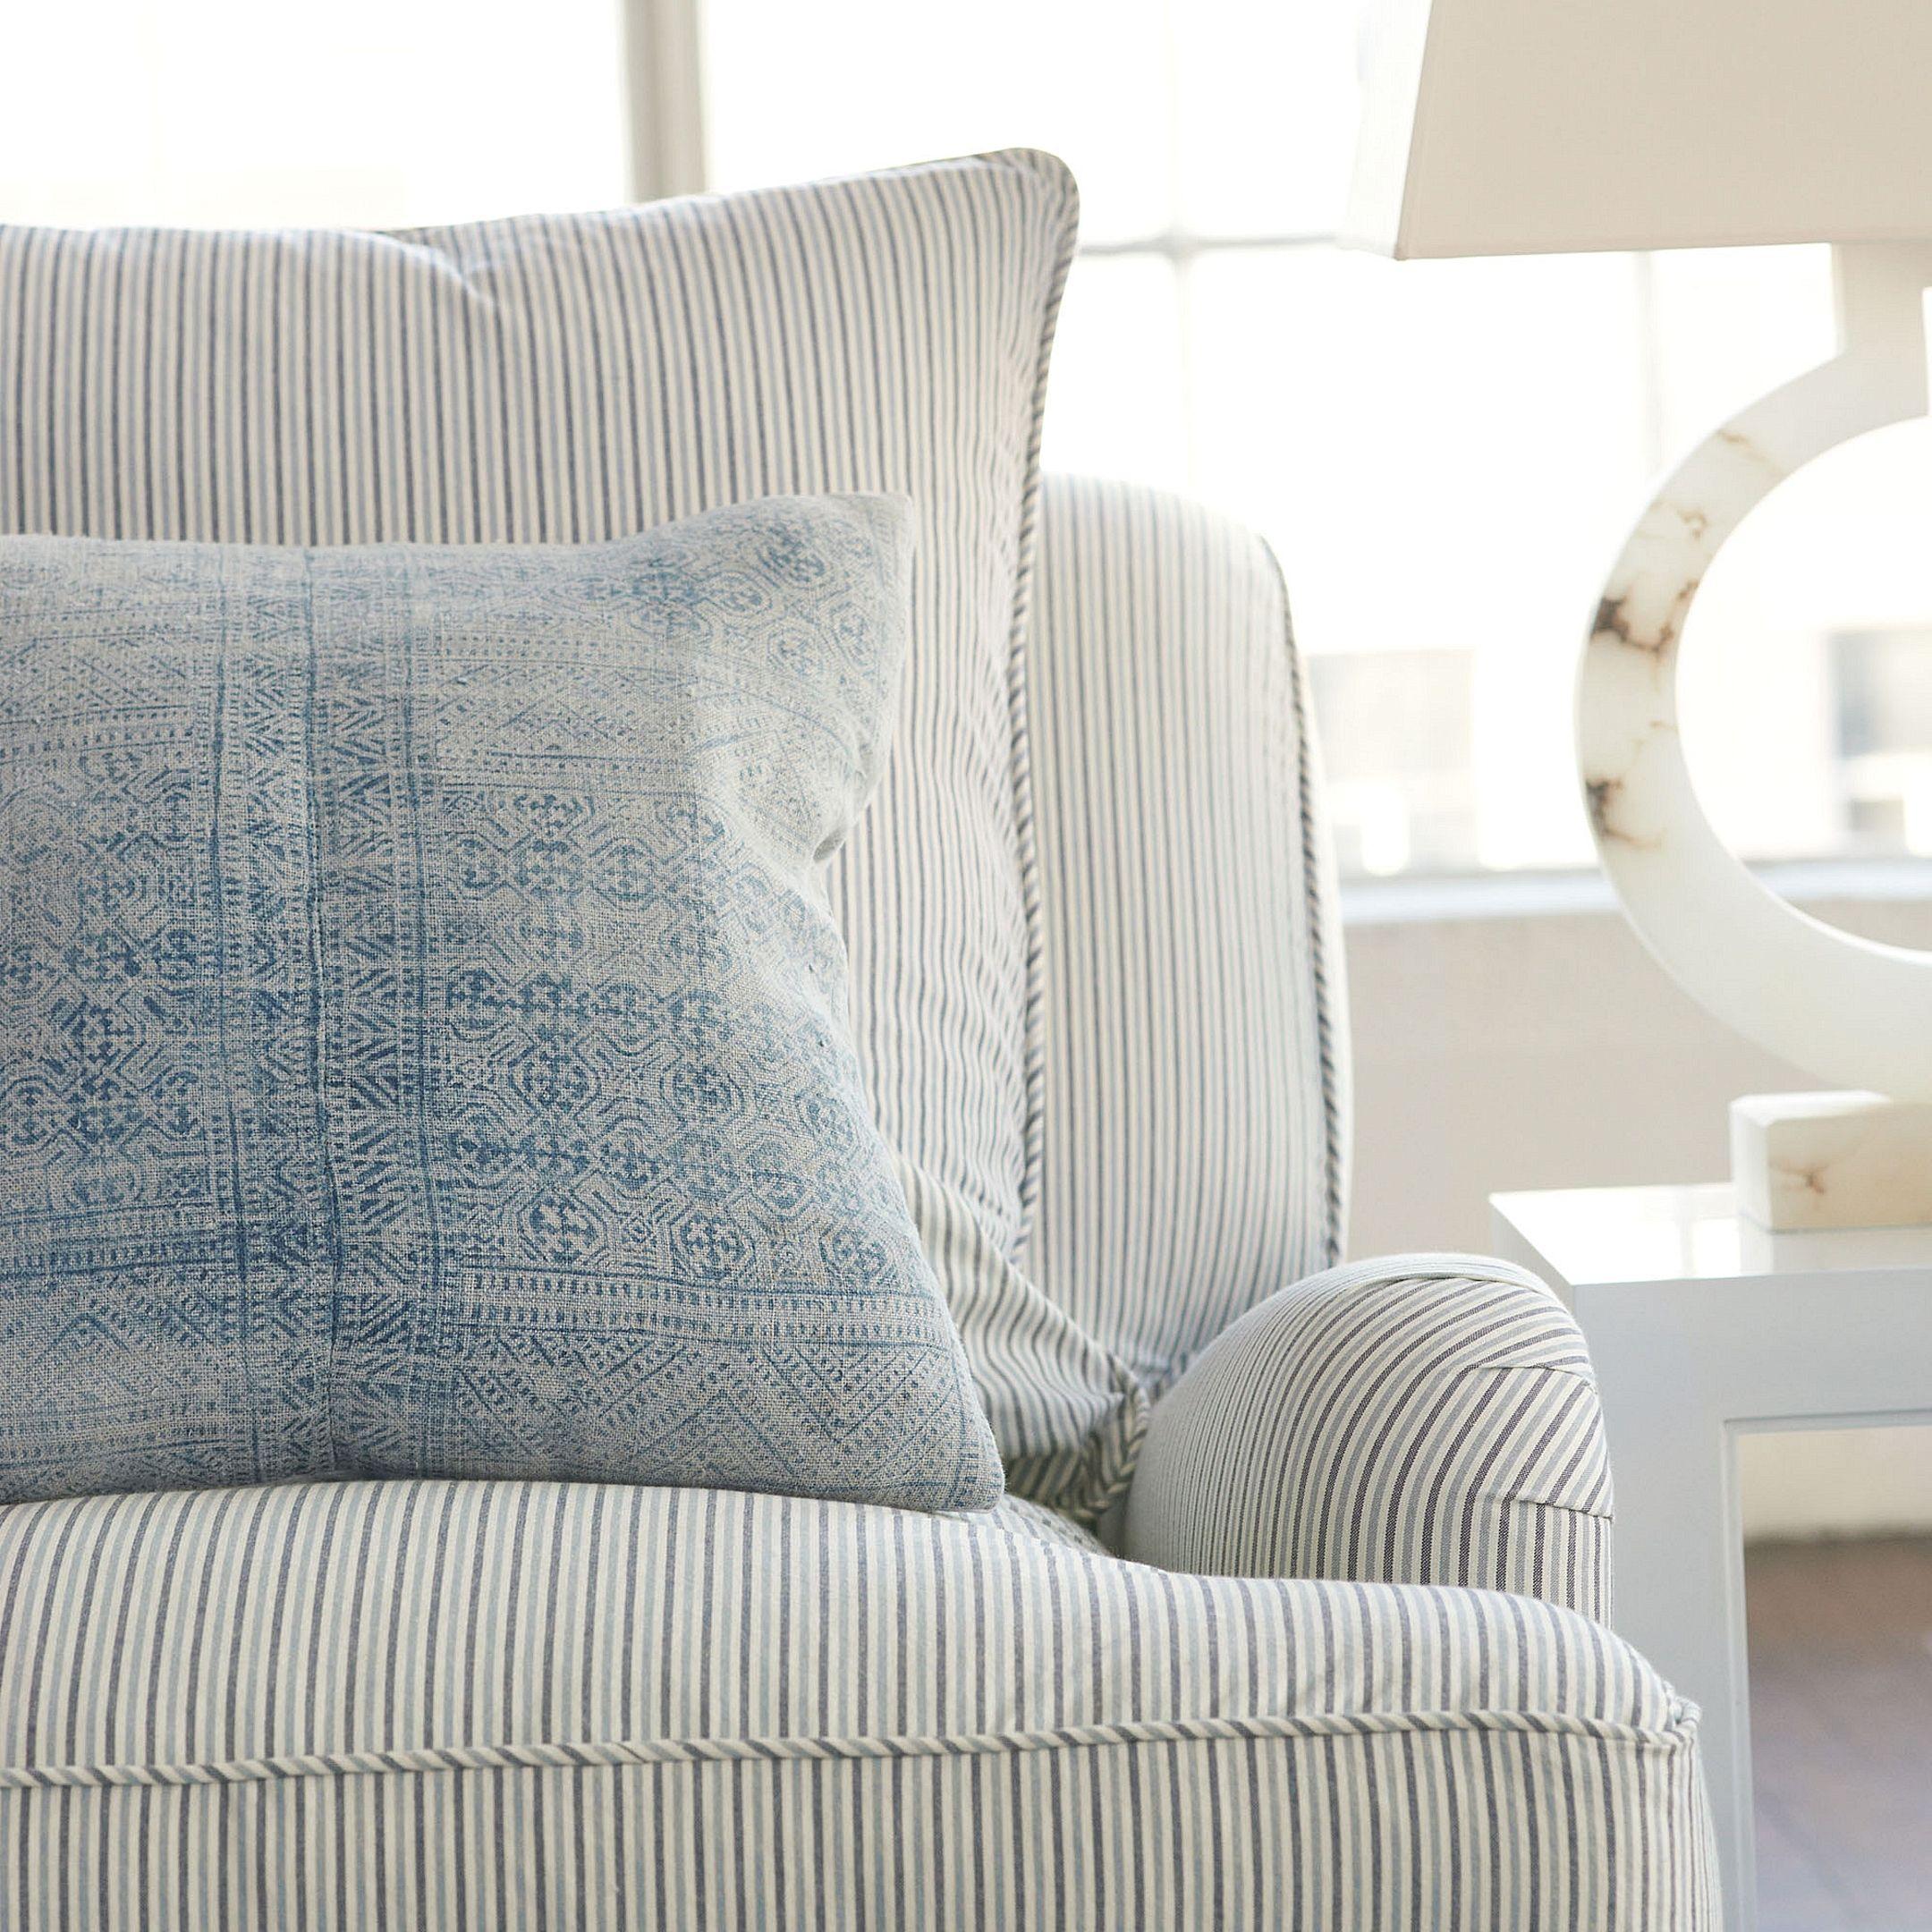 Miramar Sofa In 2020 Furniture Living Room Chairs Striped Chair #striped #living #room #chairs